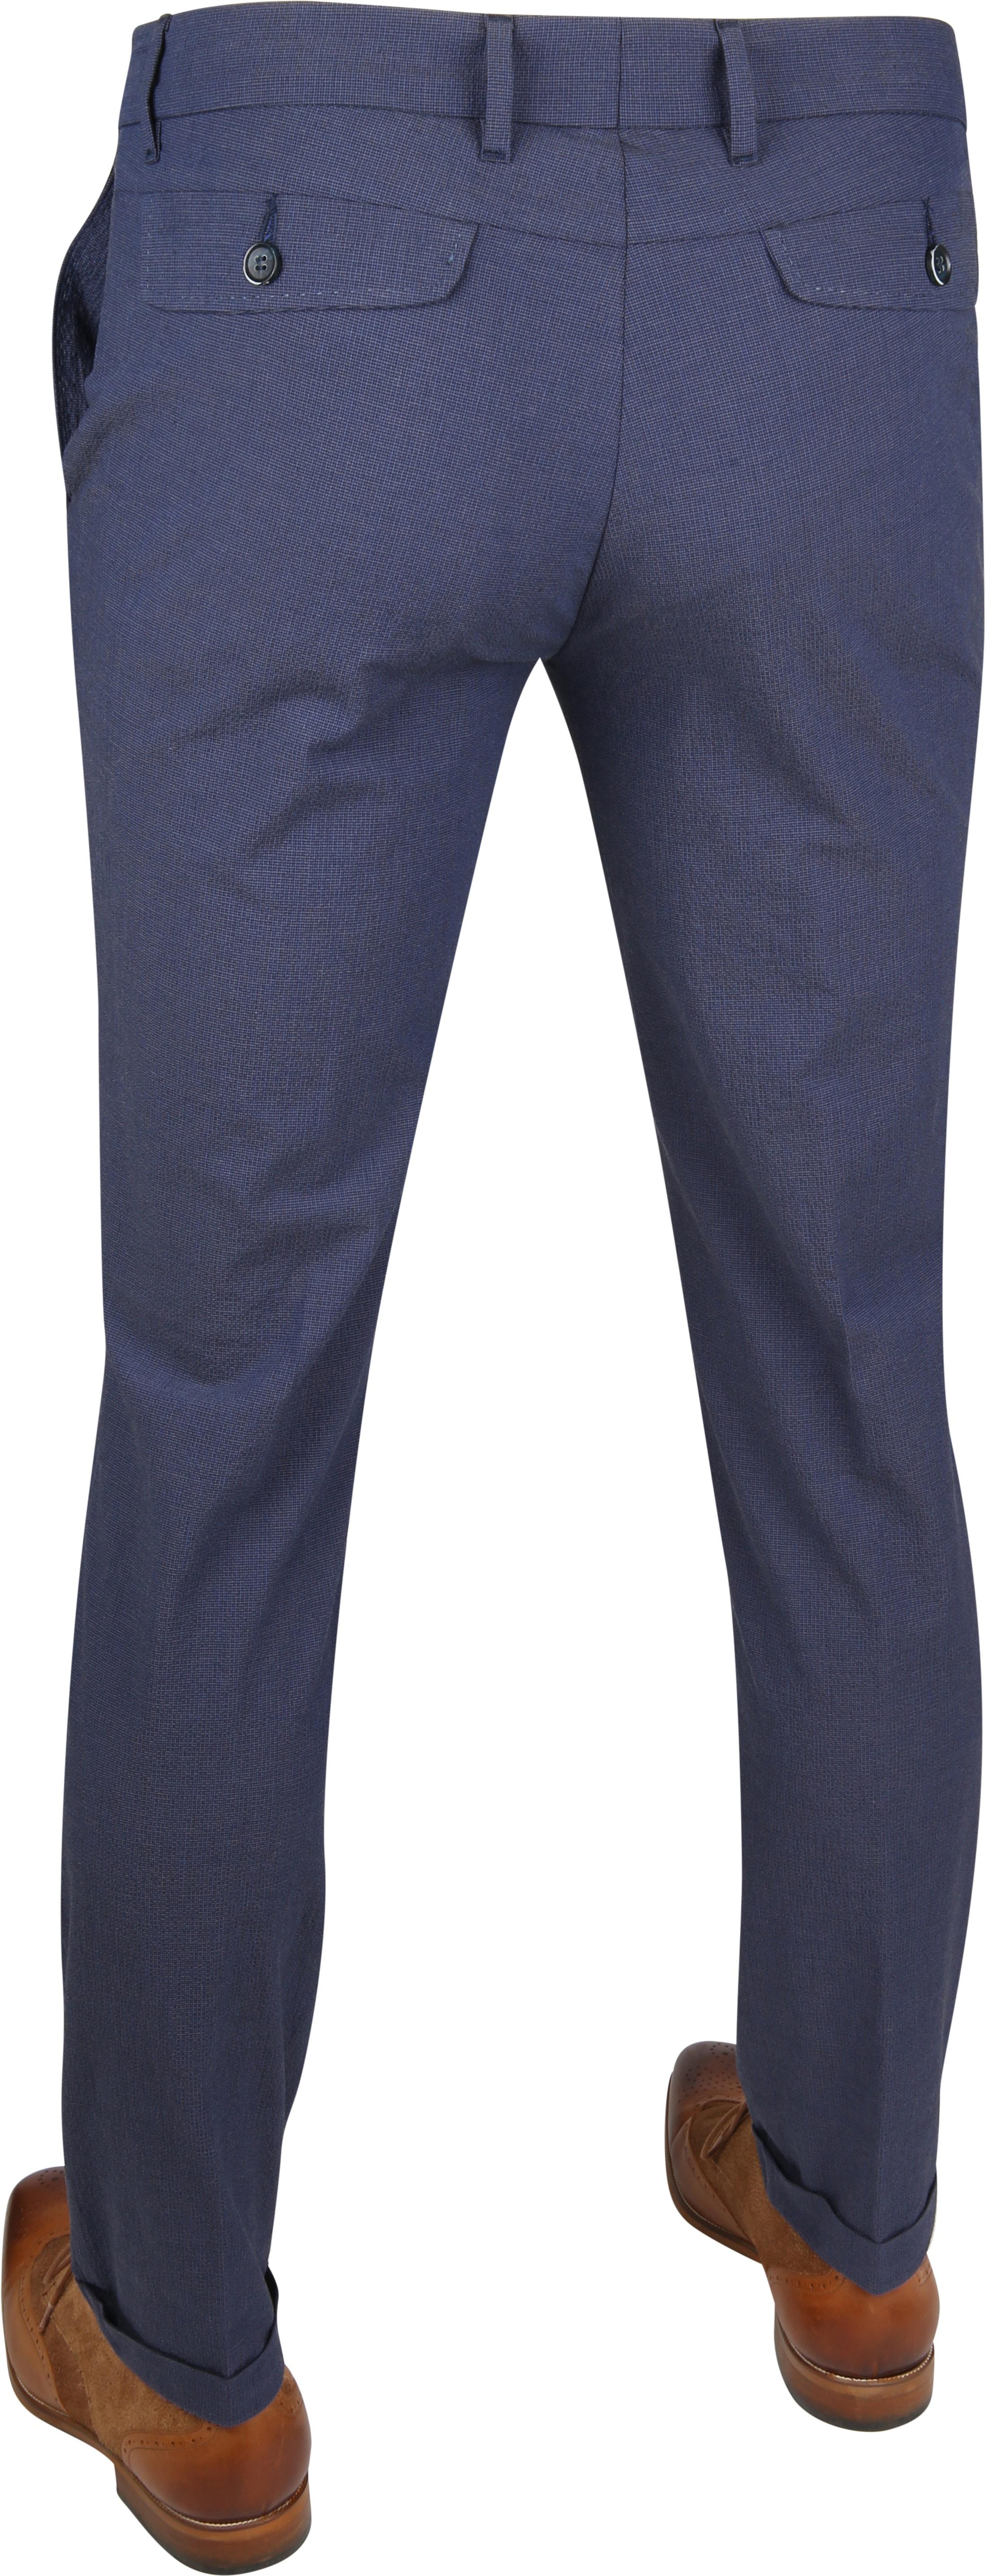 Suitable Pantalon Pisa Dessin Blau foto 3